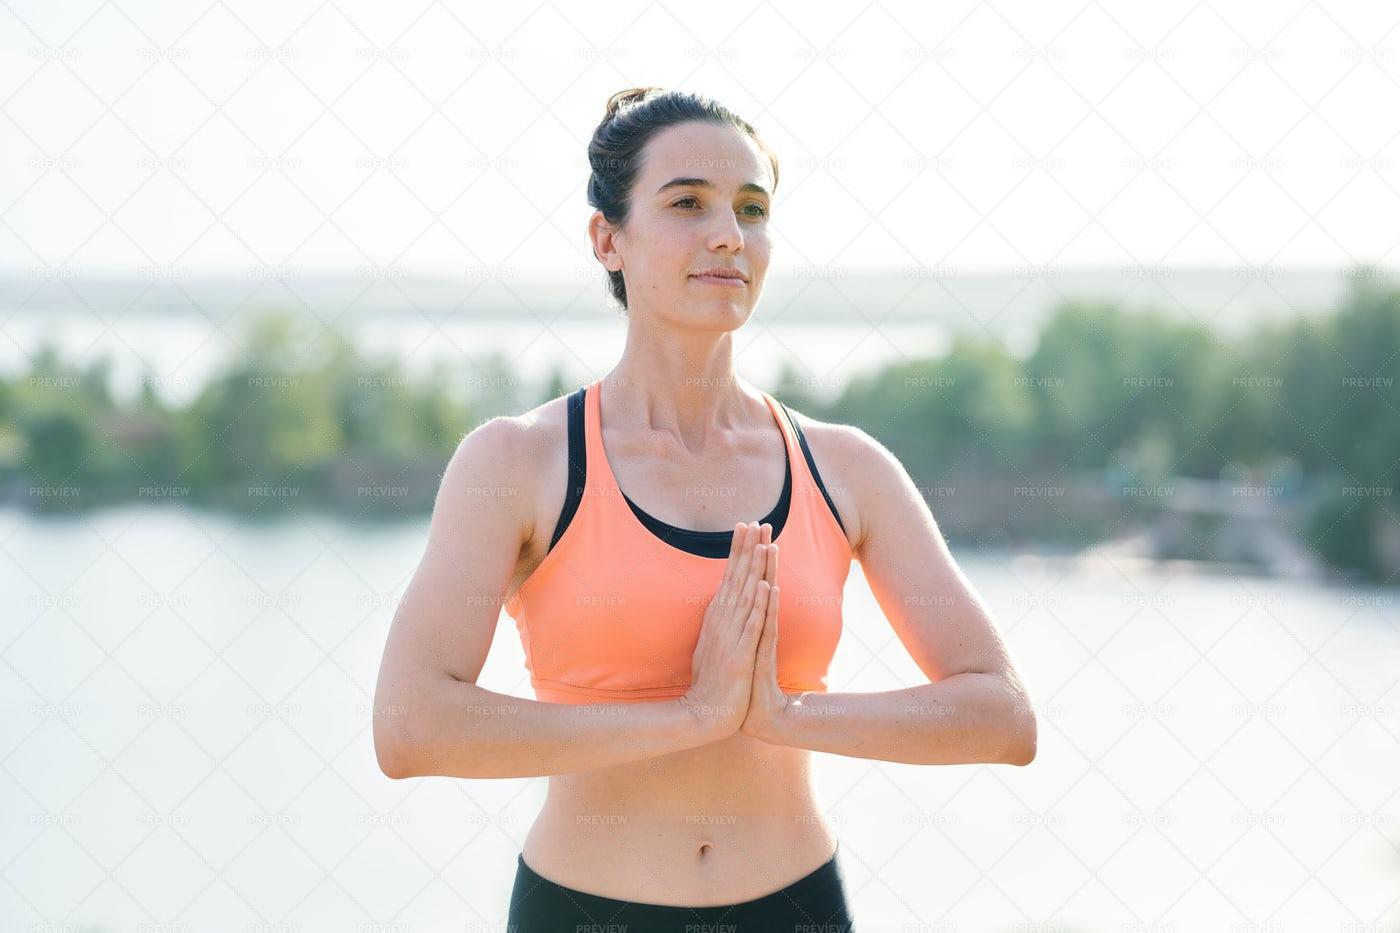 Content Yoga Coach Welcoming...: Stock Photos